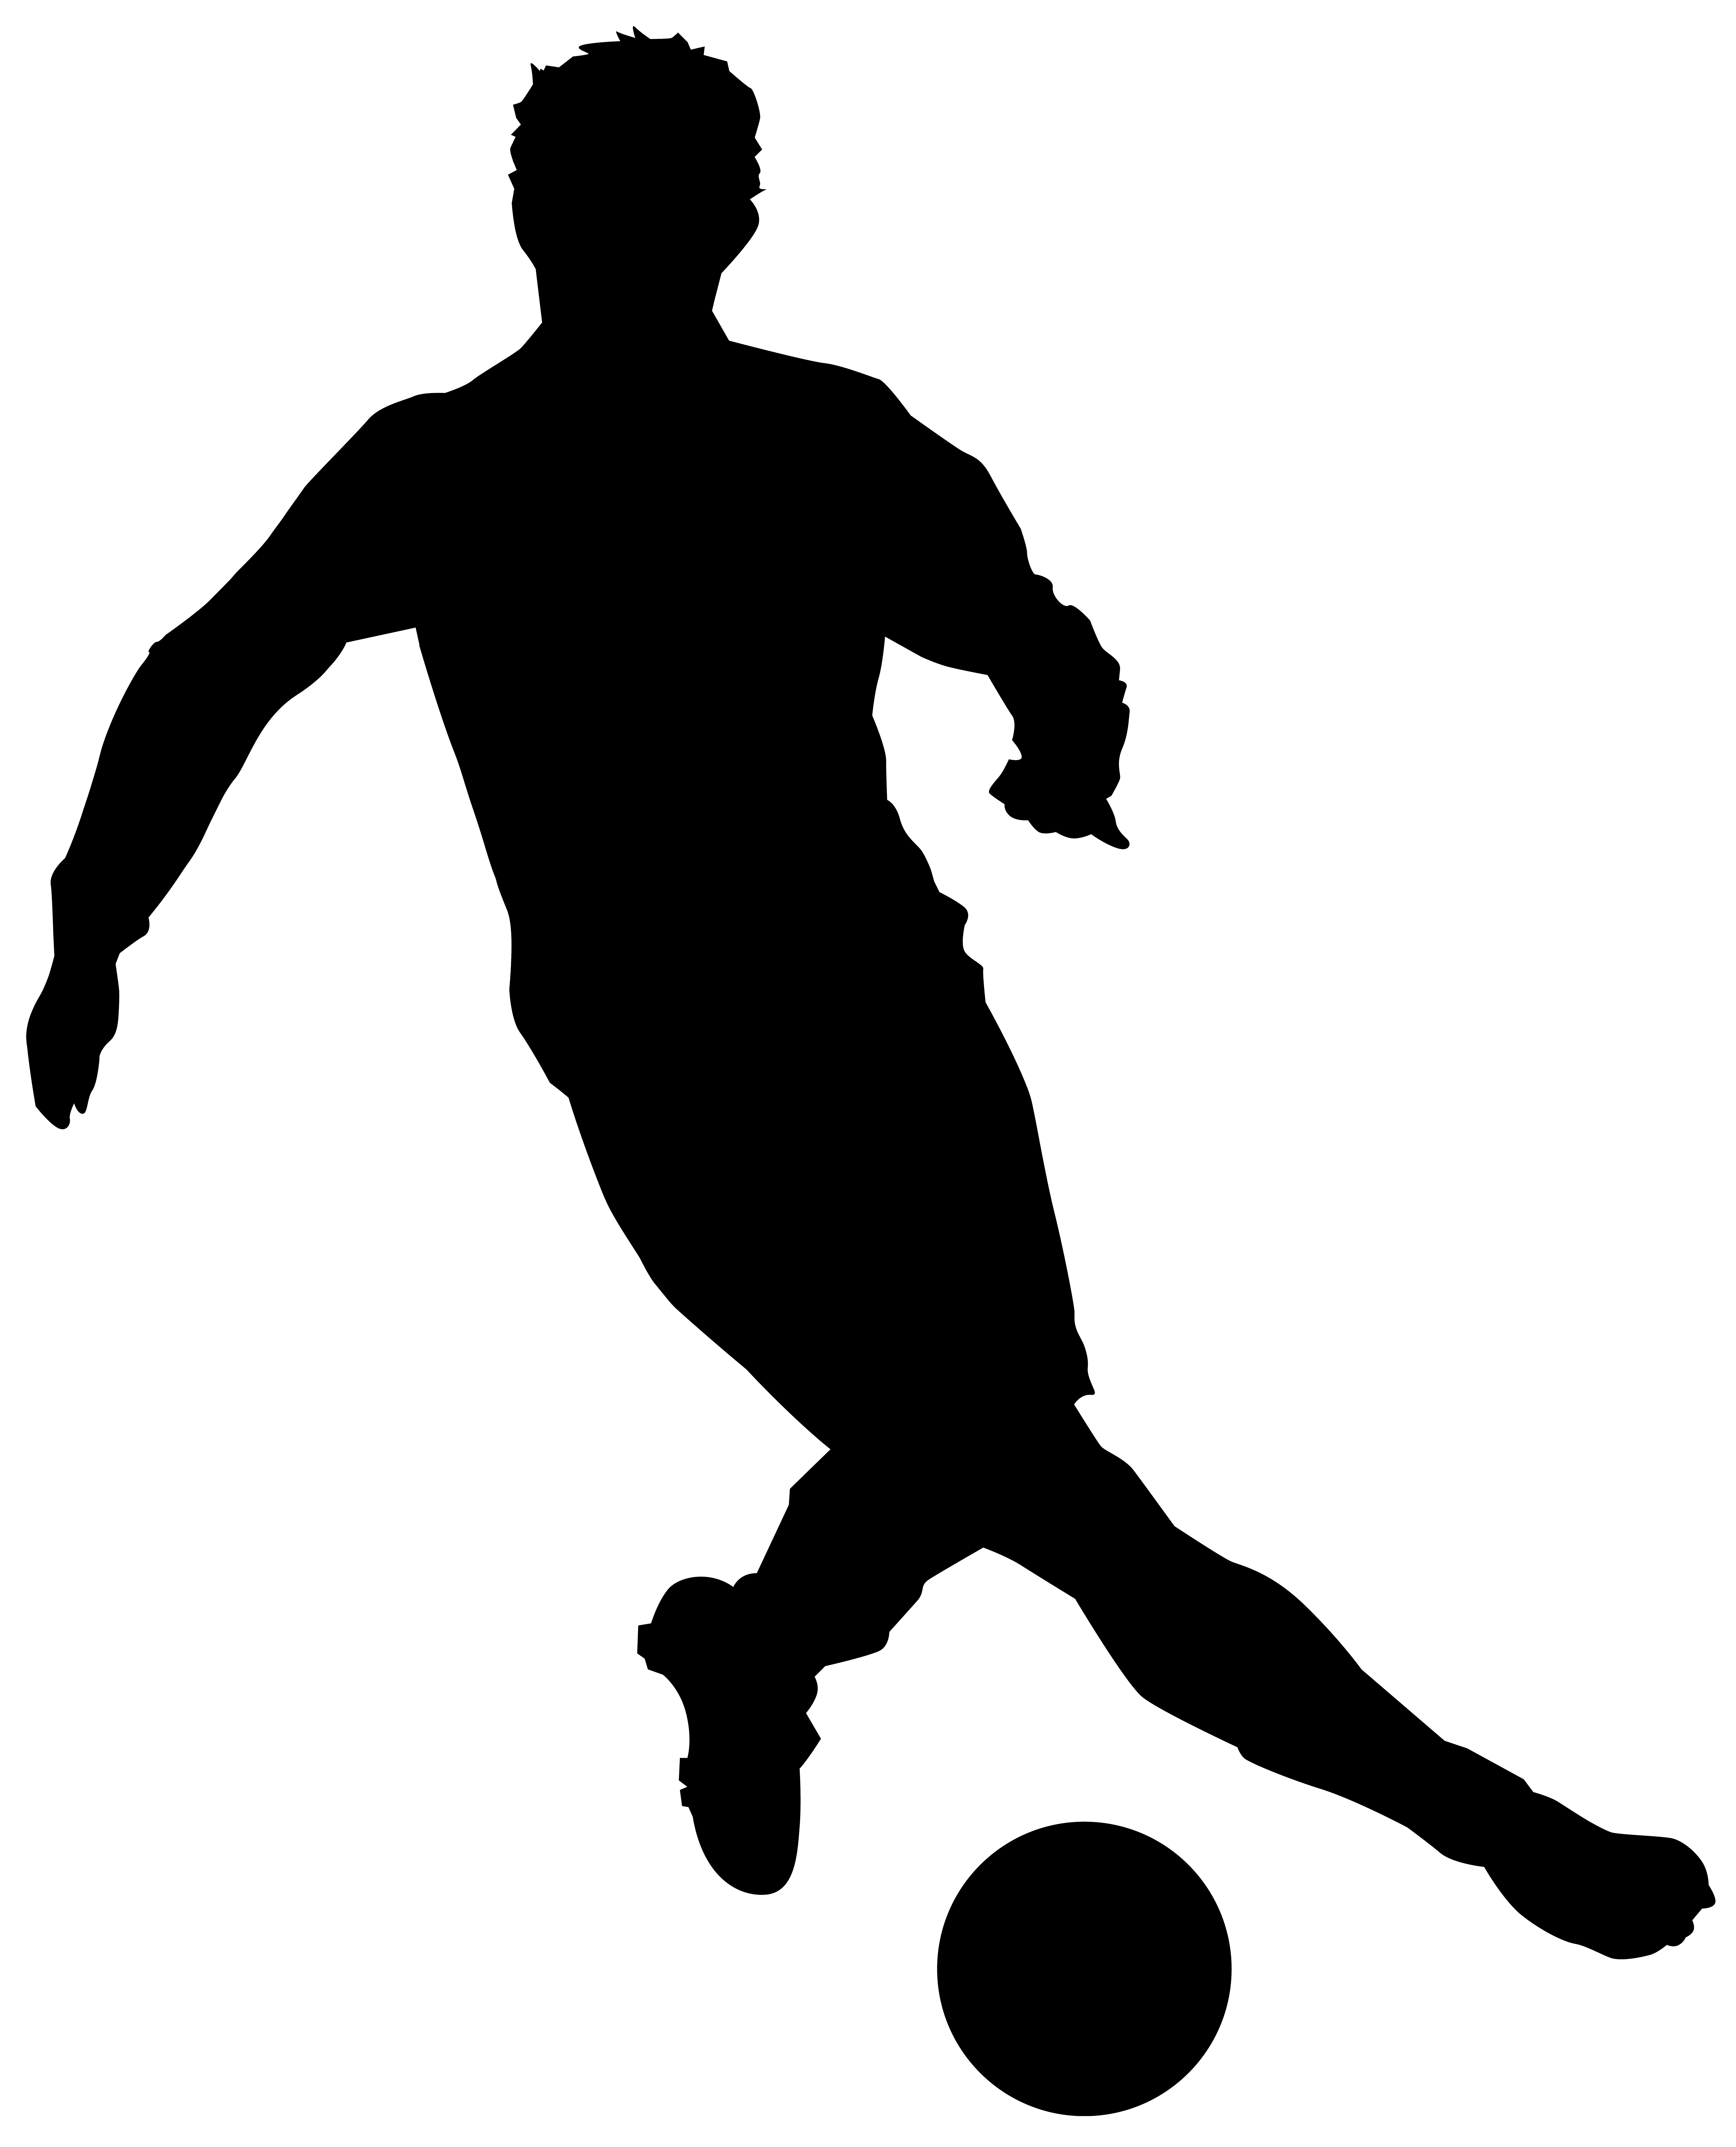 Clipart football man. Player silhouette clip art